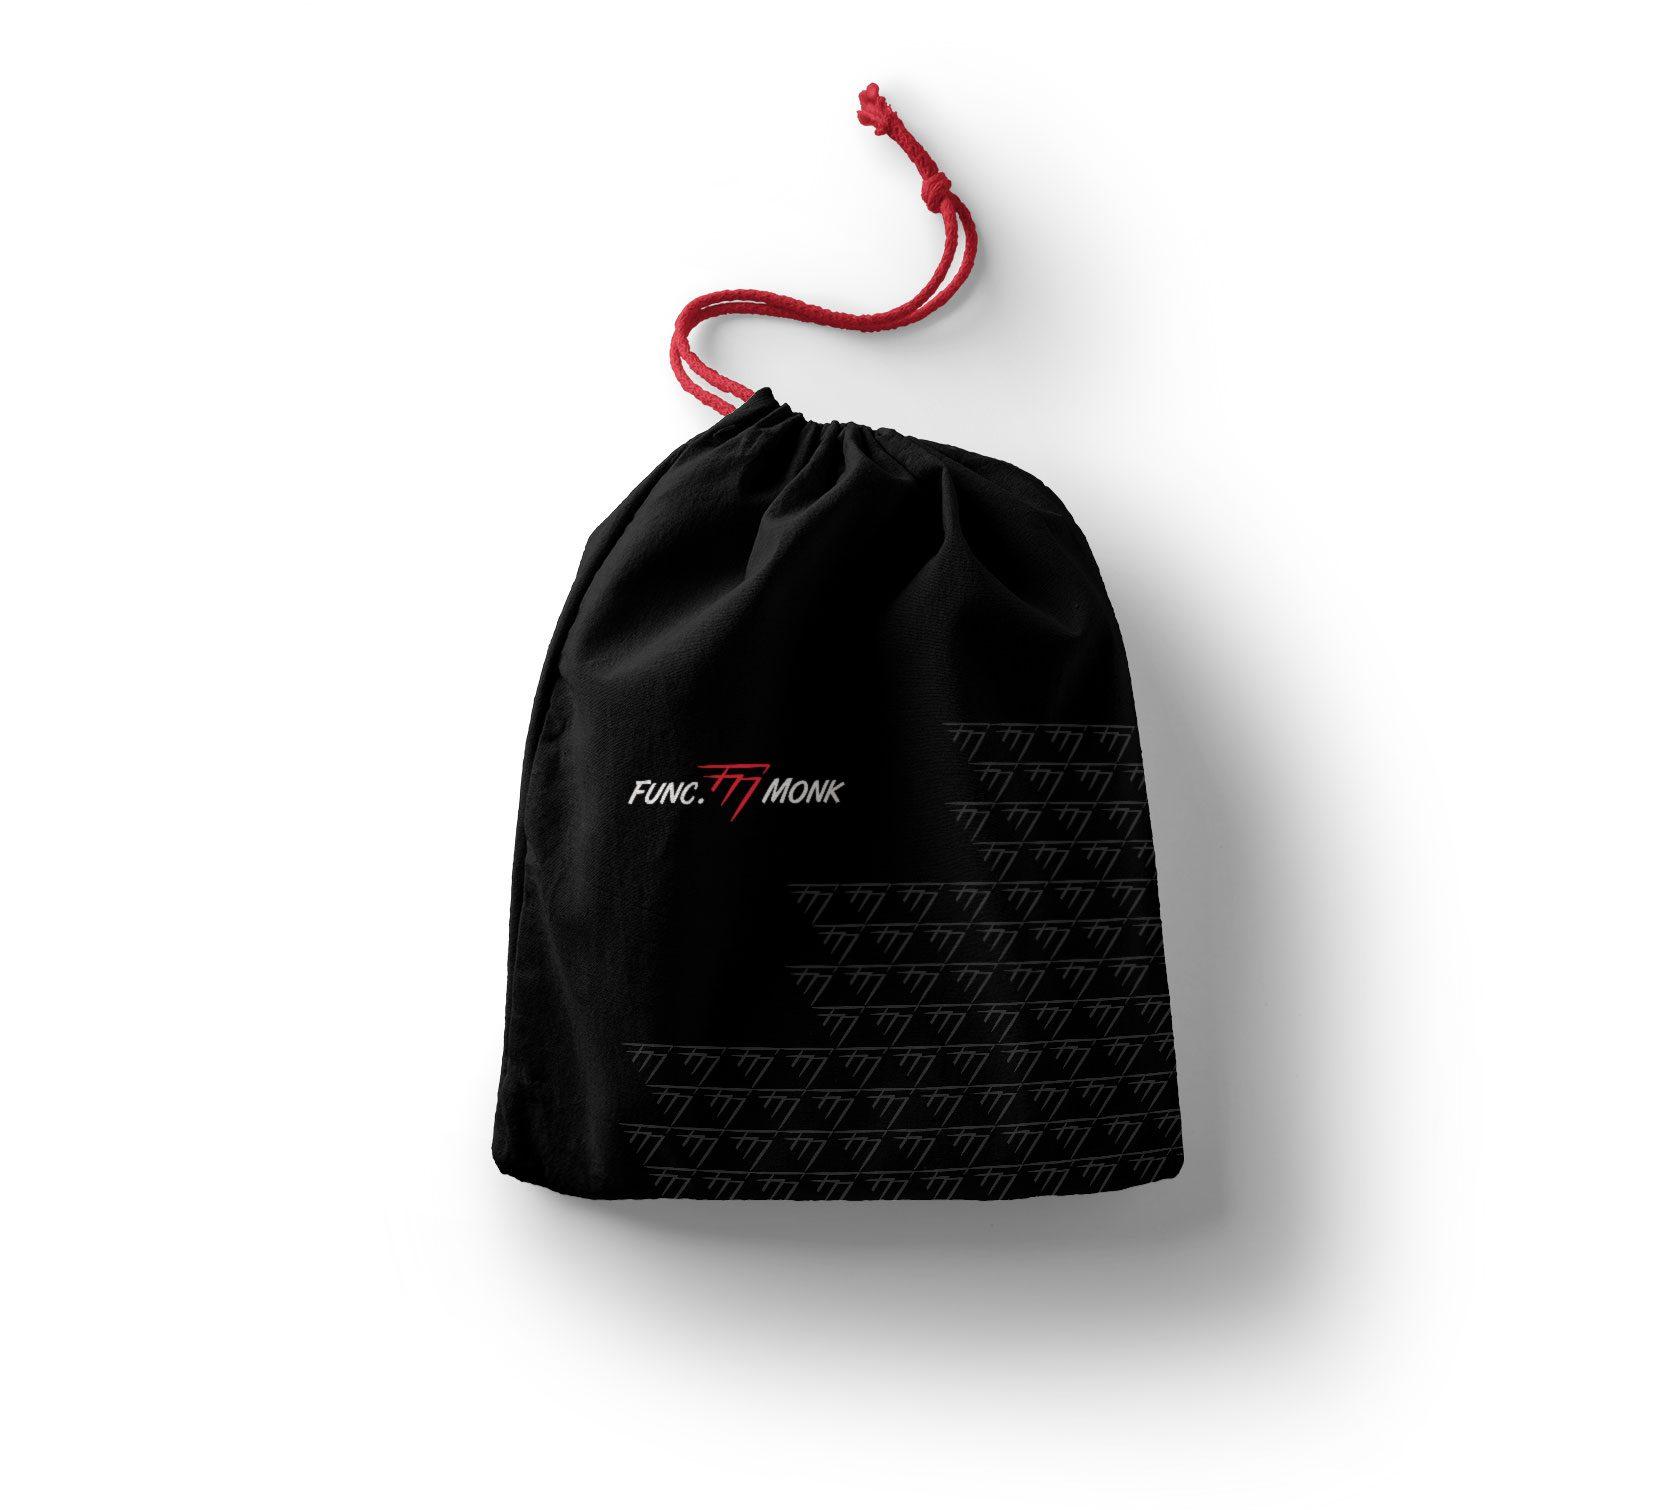 Func Monk Merchandise Drawstring Bag Design by Furia